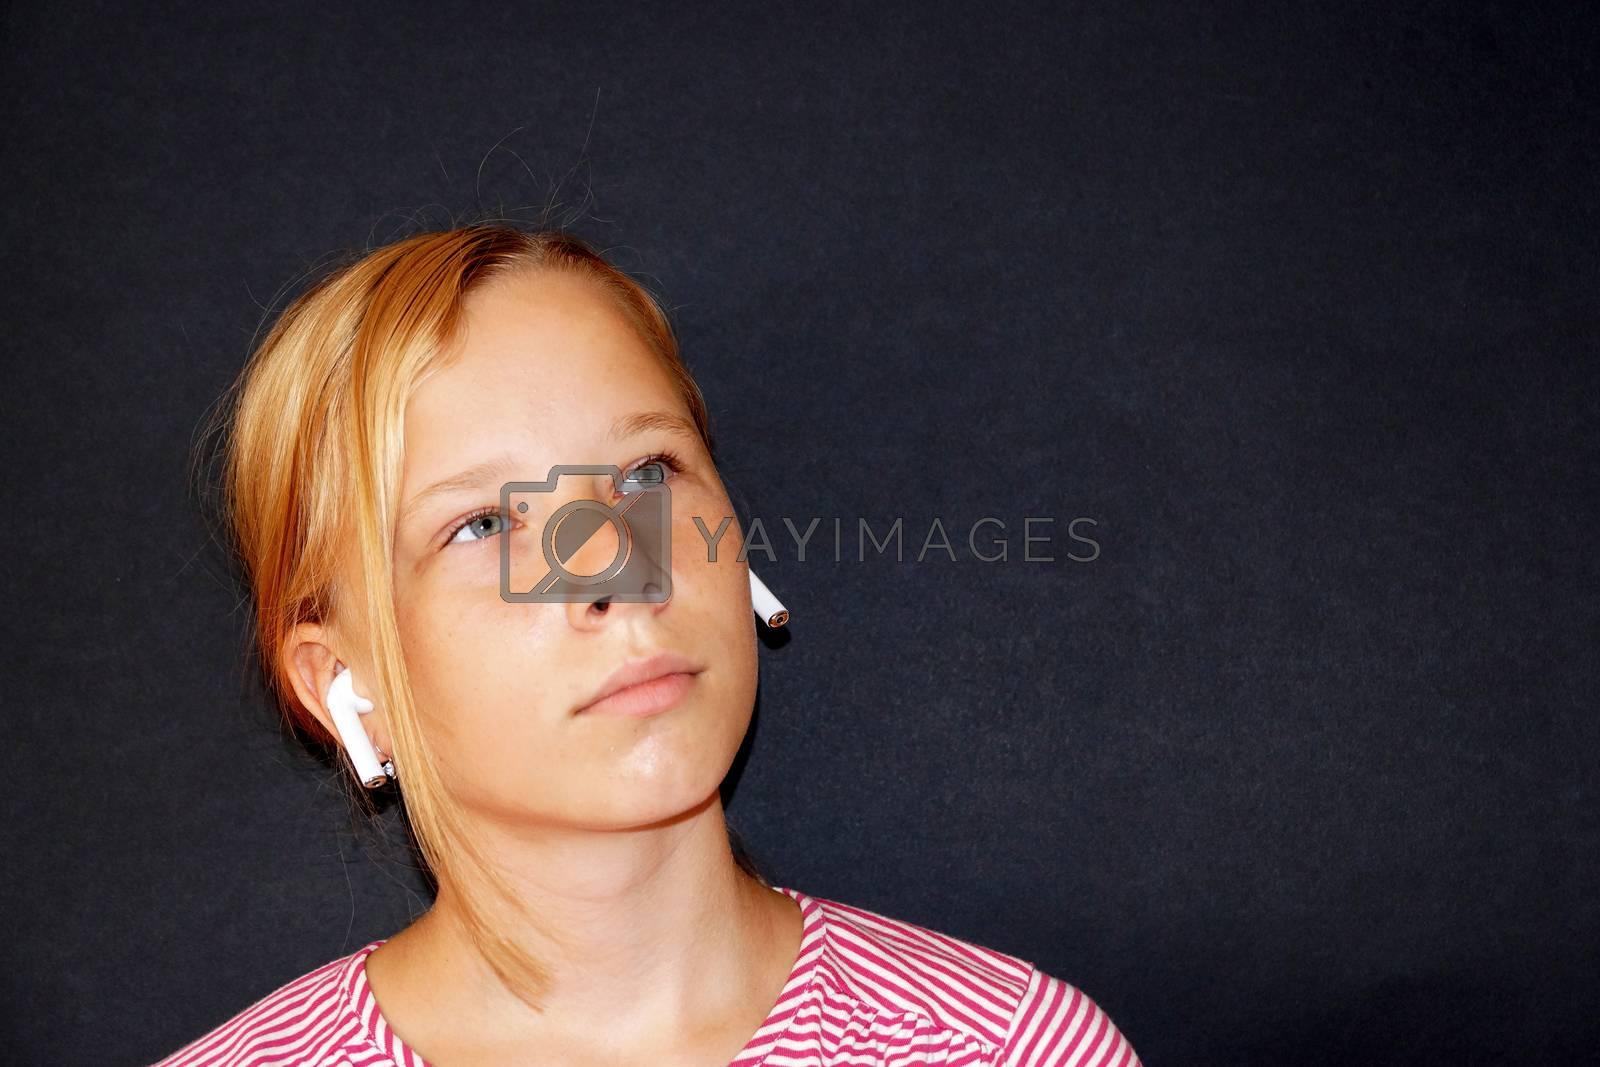 teenage girl listening to music on headphones , portrait on black background.